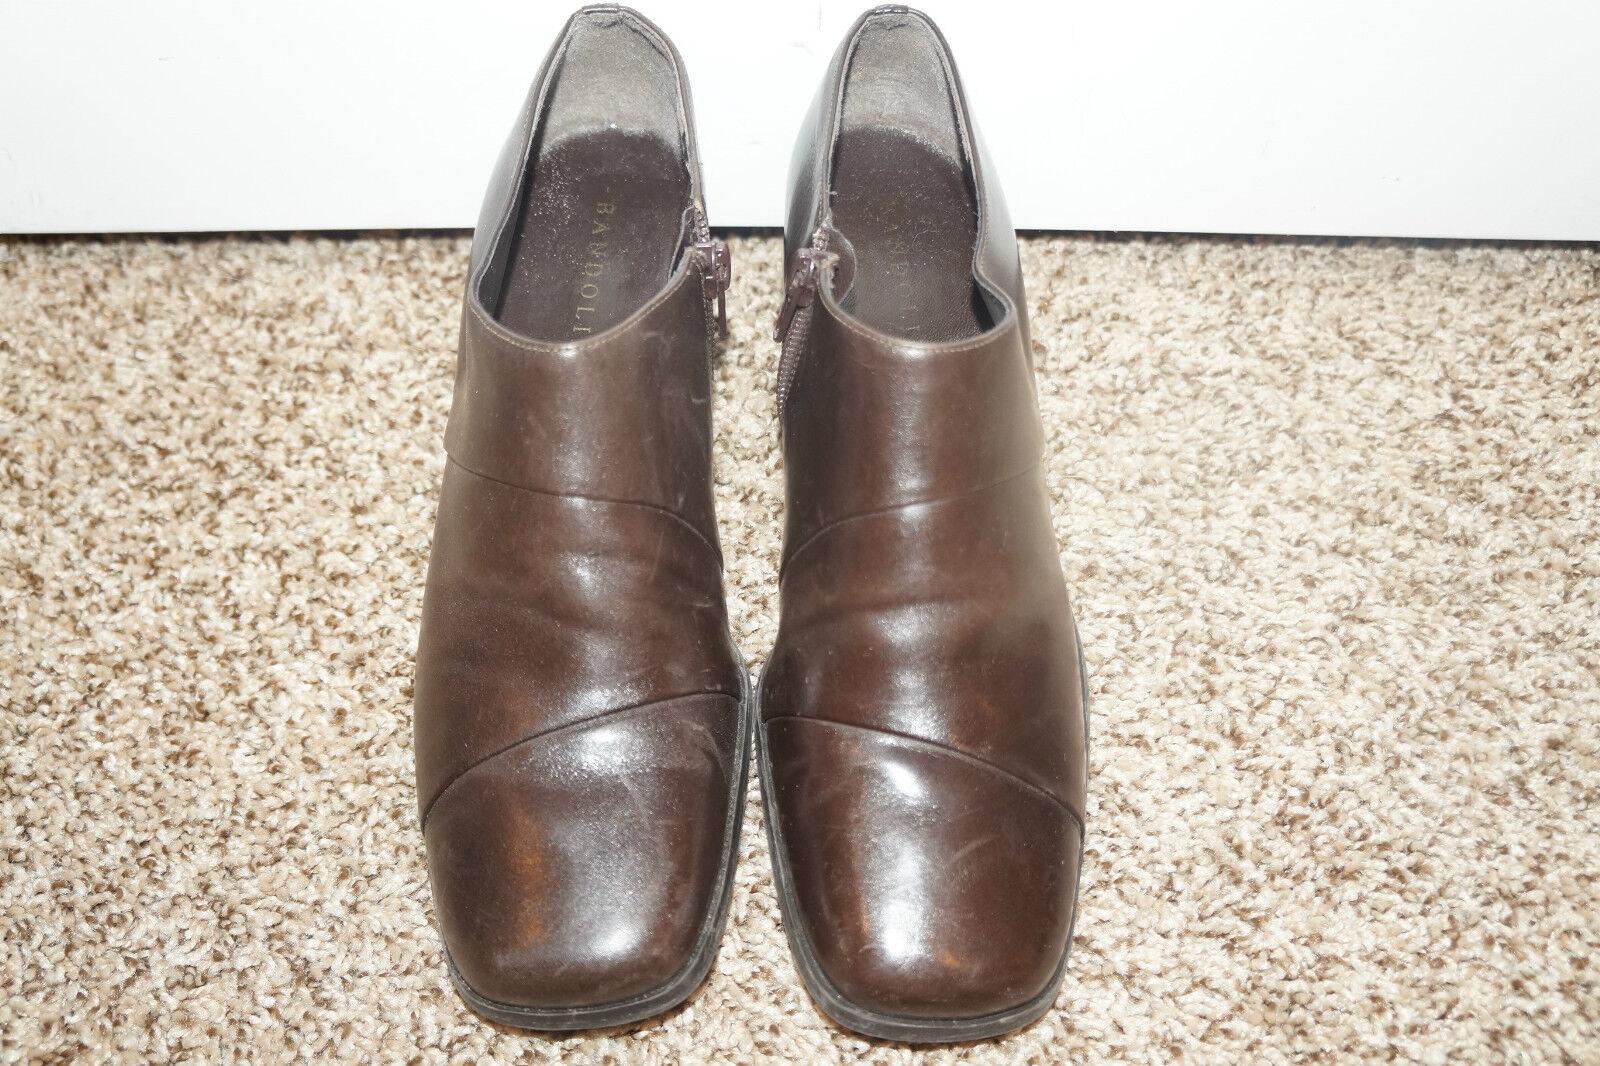 Bandolino Womens Dark Brown Leather Ankle Boots Sz 7.5M 7.5 M LADIES Zip Up